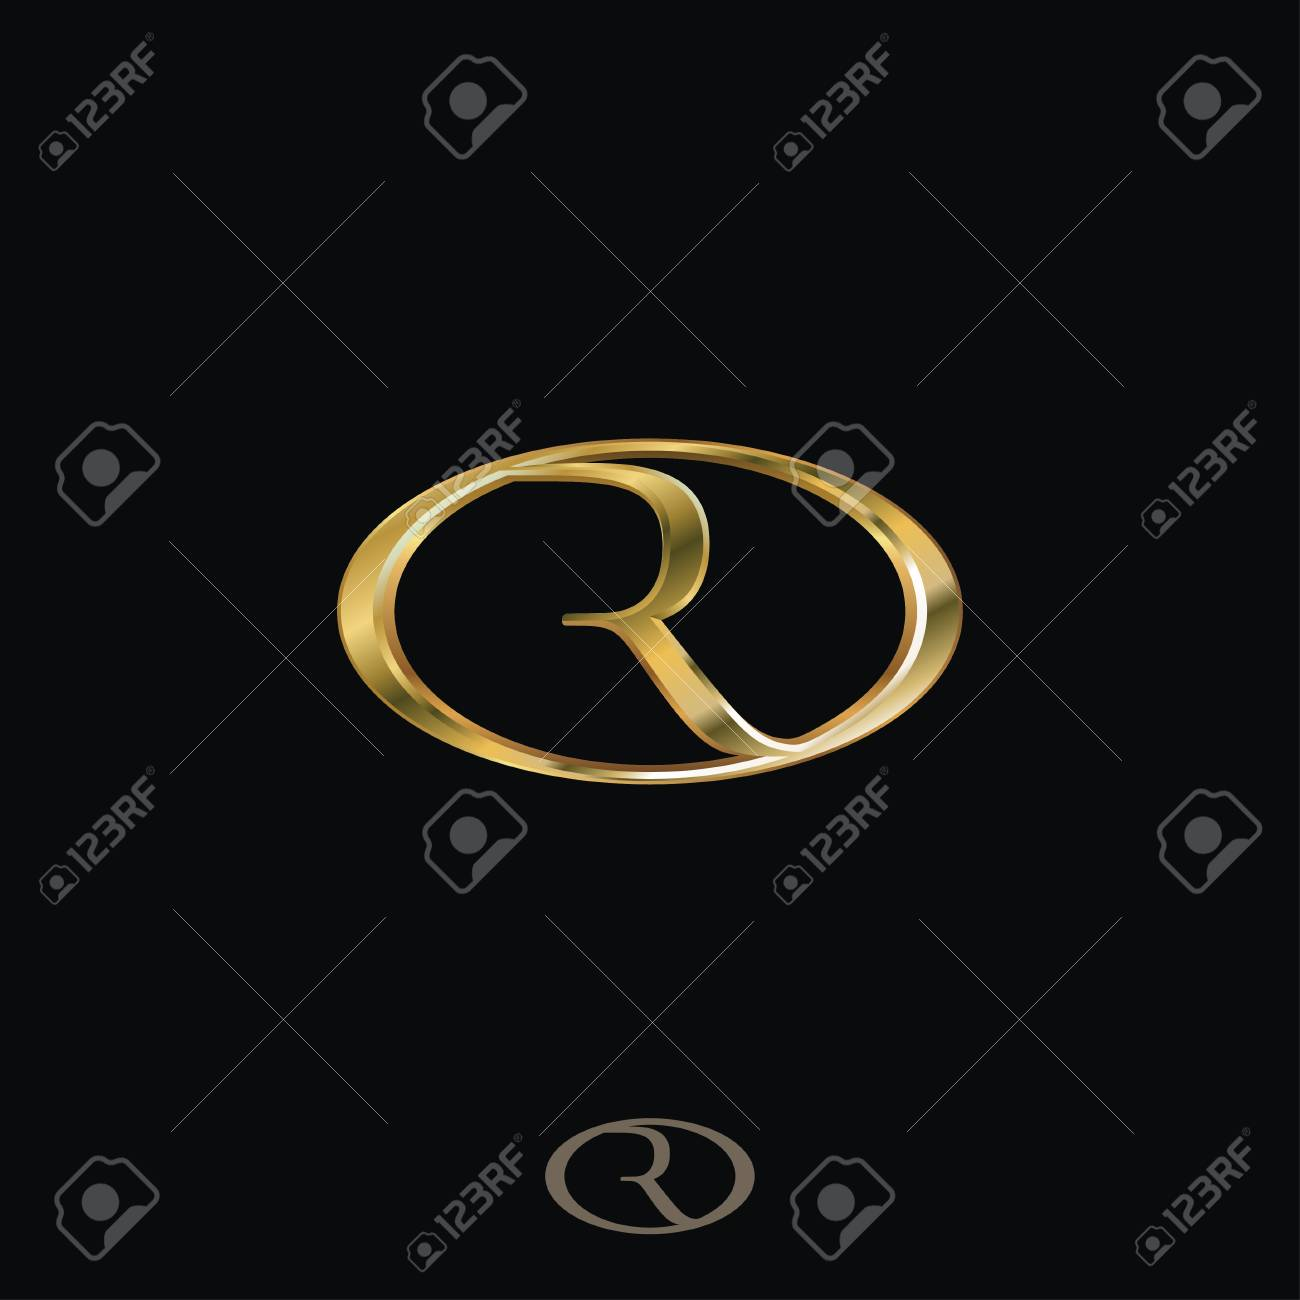 Creative Luxury Letter R Logo concept design templates - 75896326